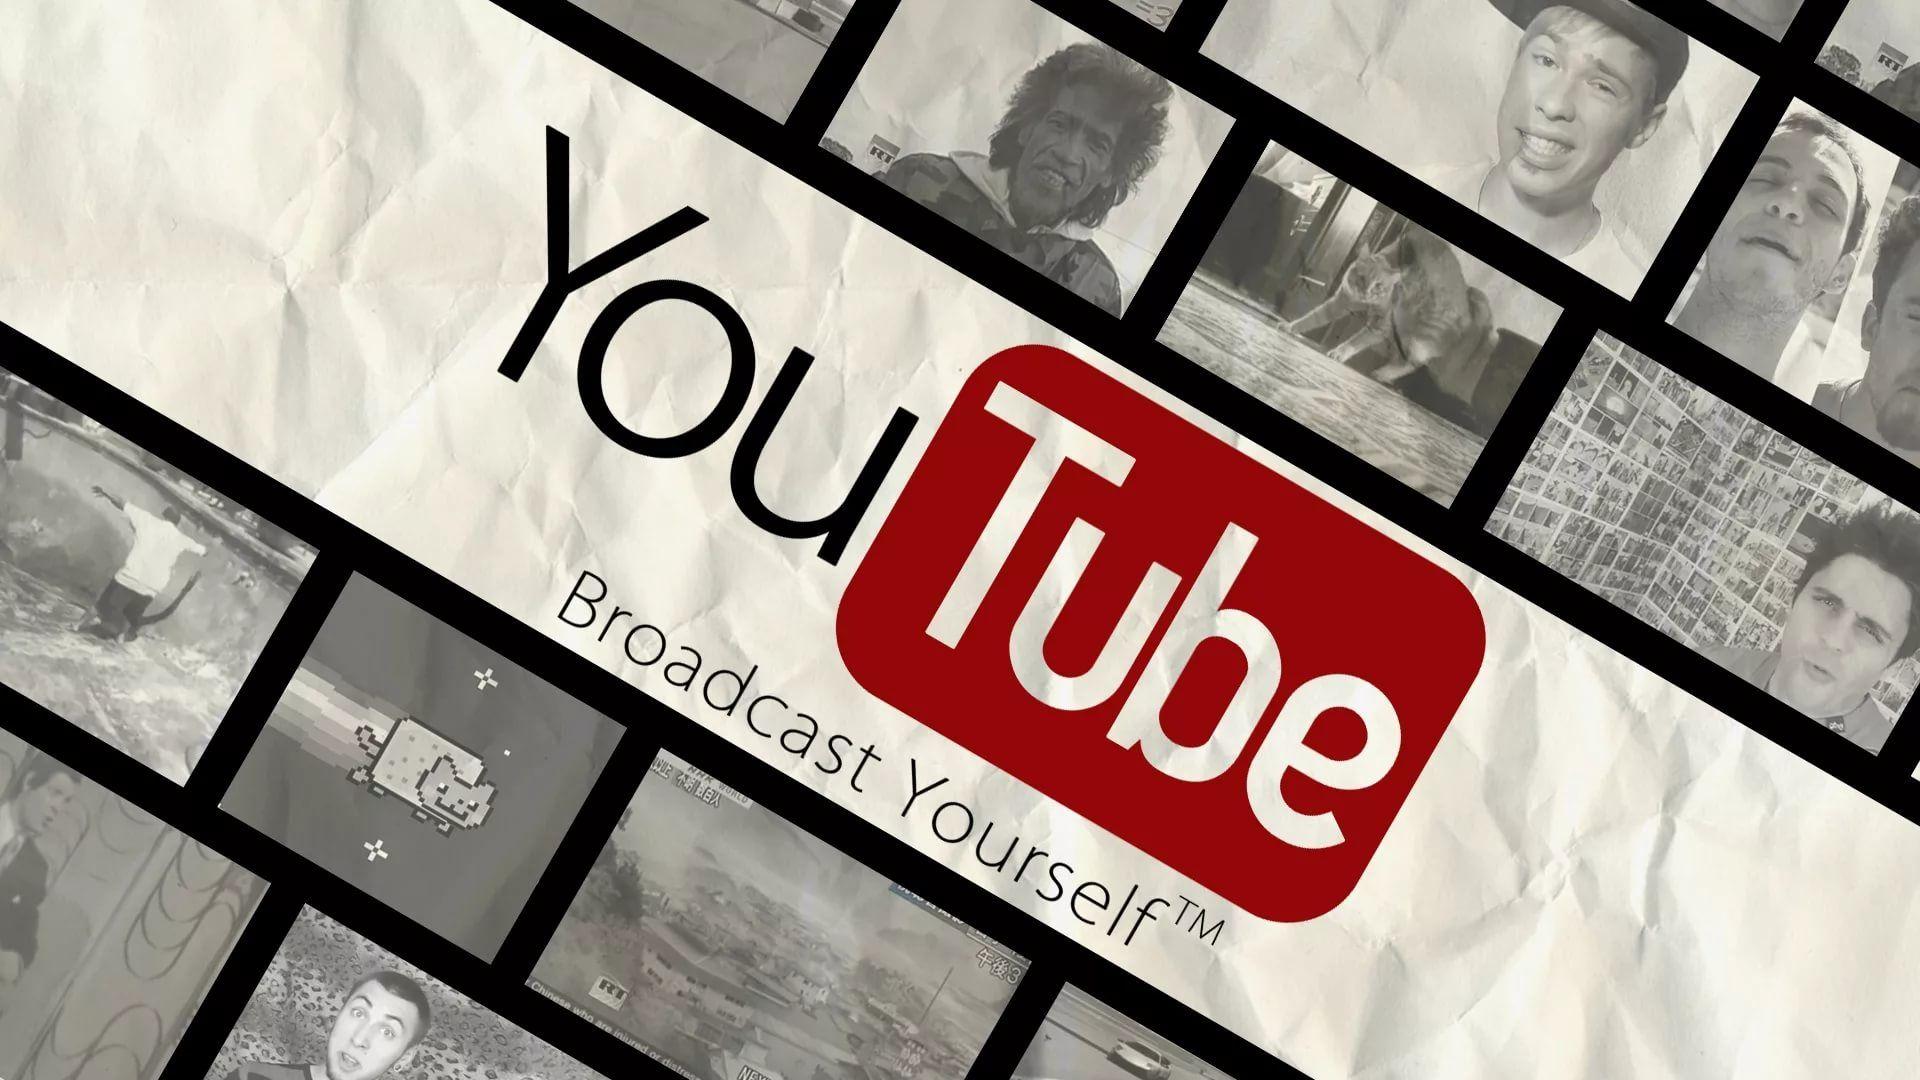 Youtube a wallpaper